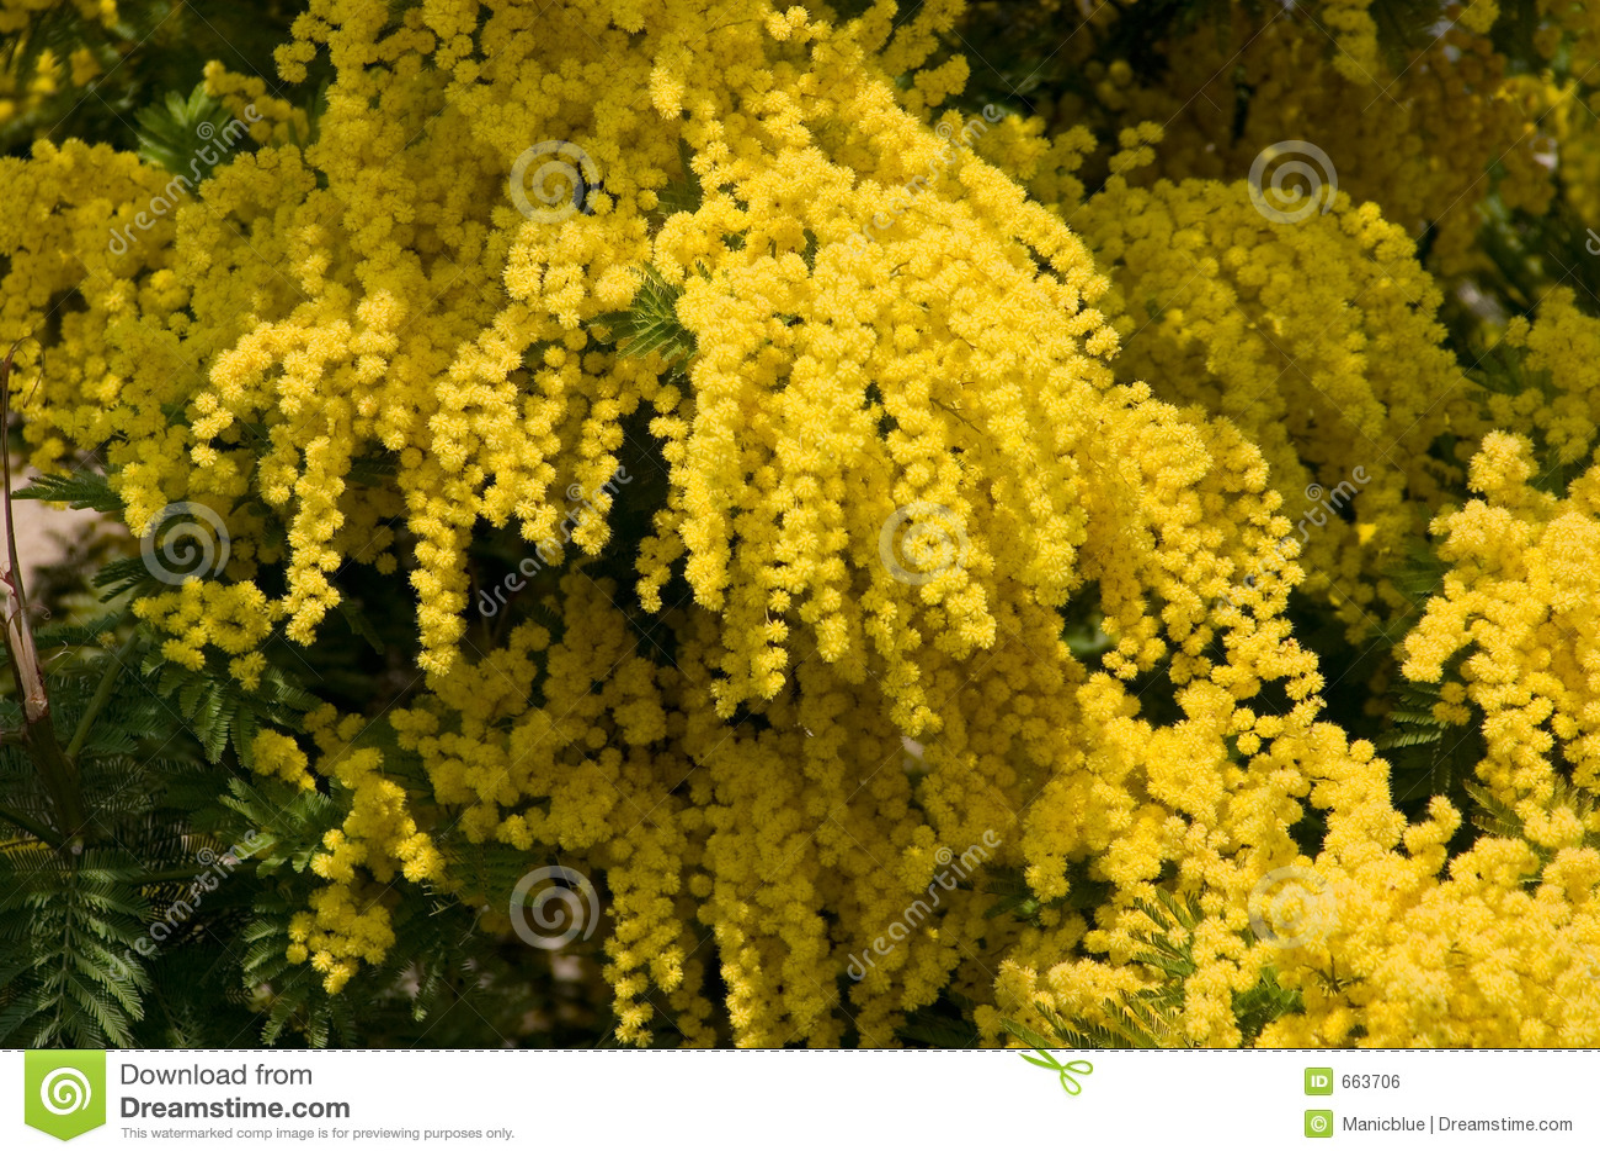 gelbe mimose stockfoto bild von gelb drau en wattle. Black Bedroom Furniture Sets. Home Design Ideas